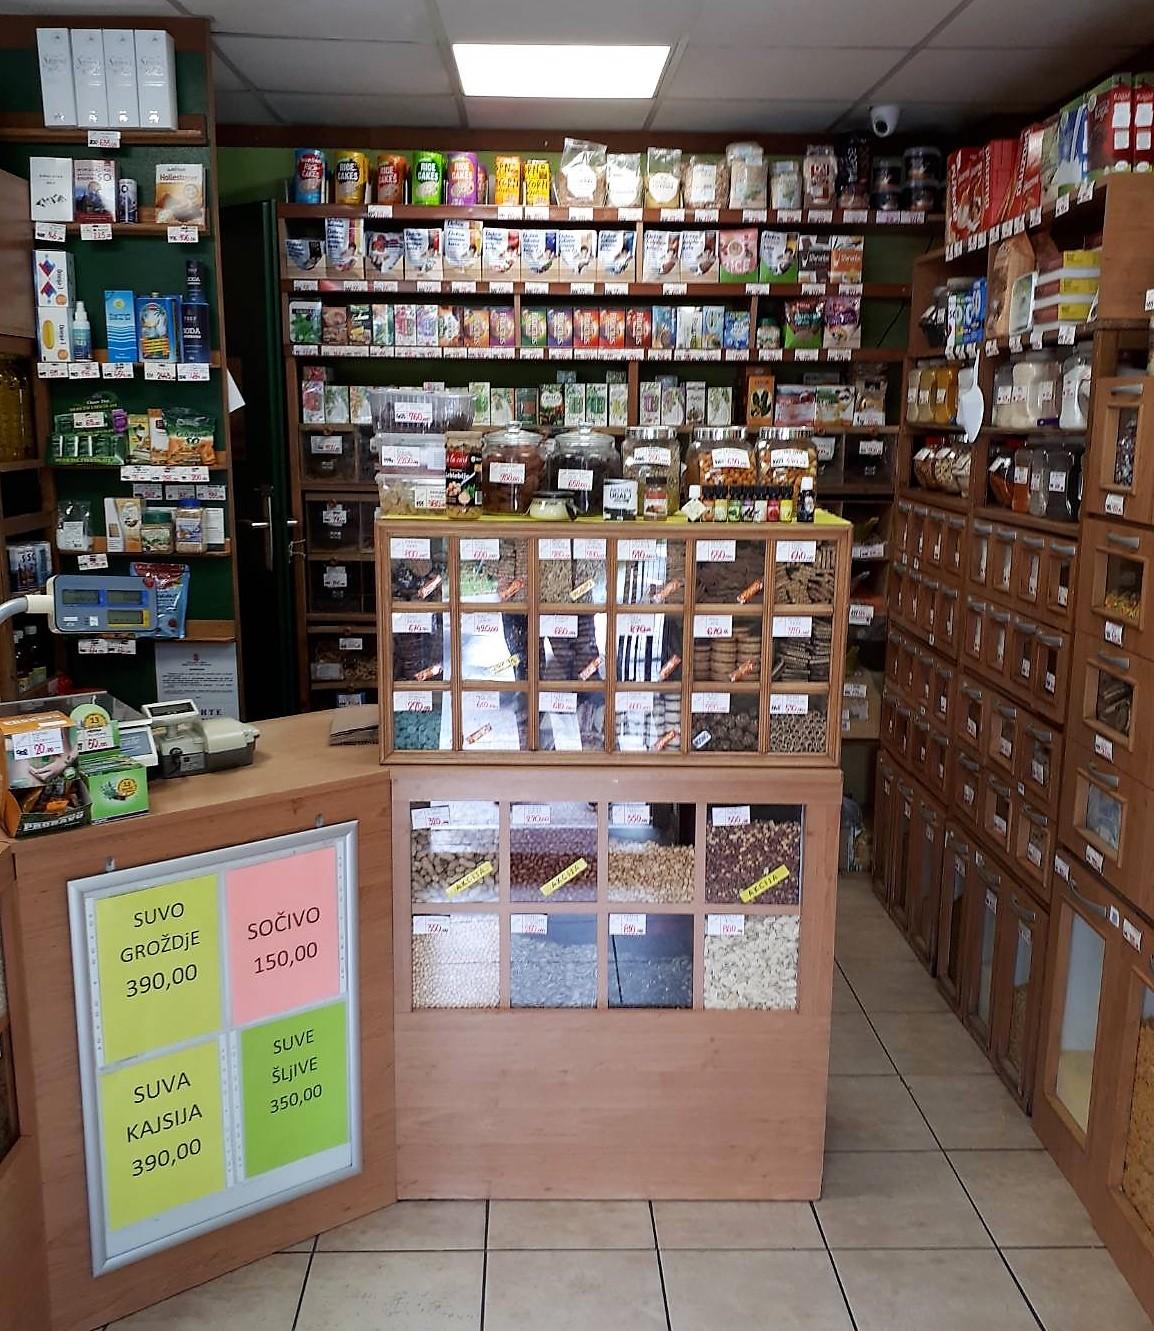 prodavnica_zdrave_hrane_libra_kumodraska_unutra